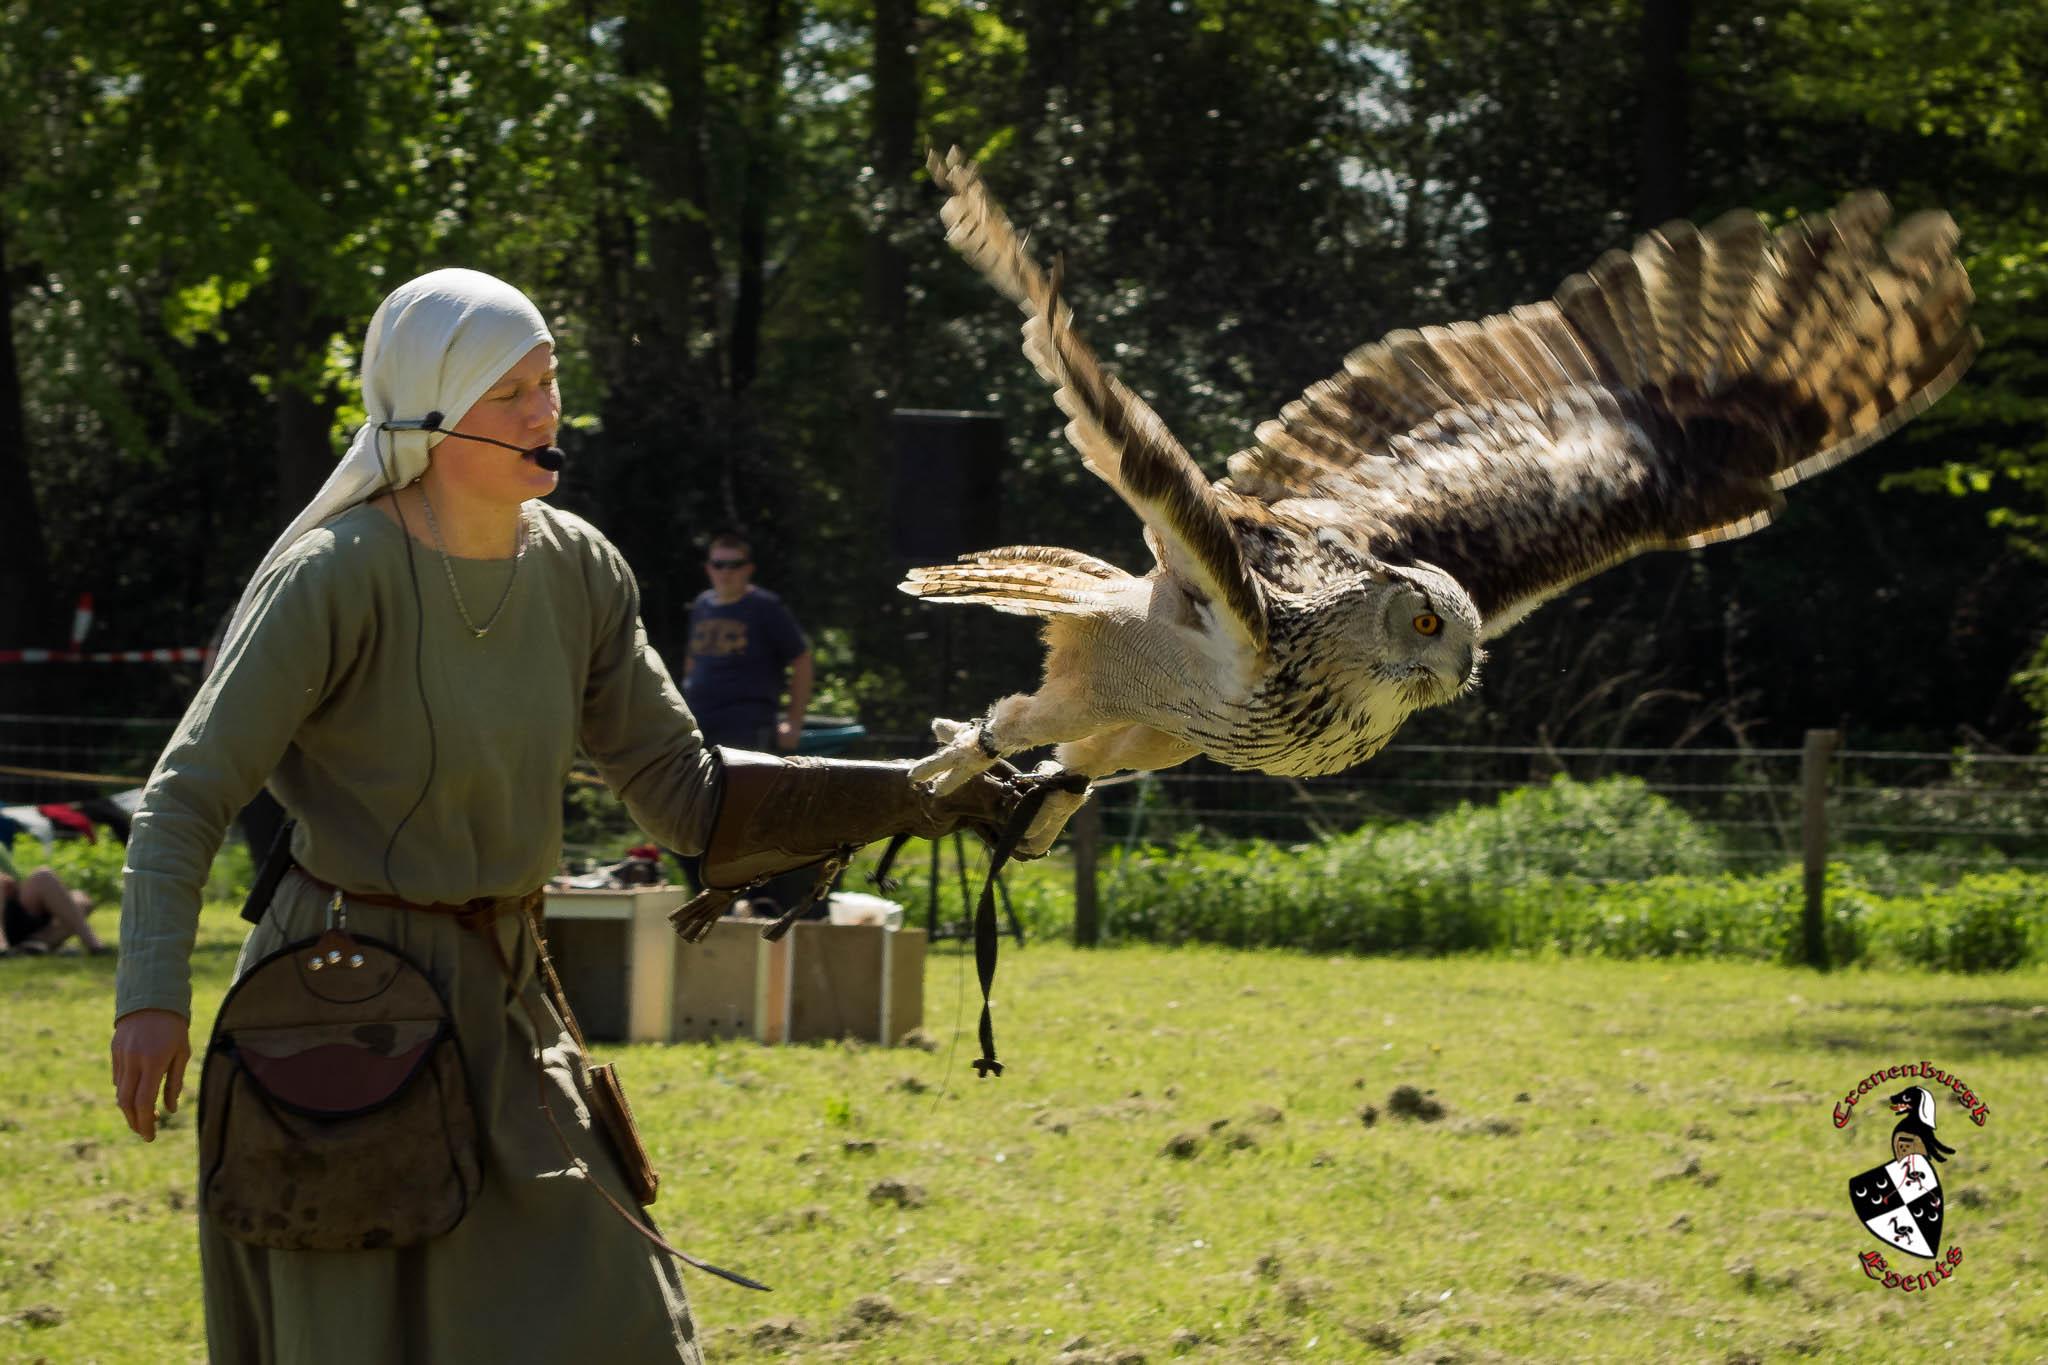 Middeleeuws-Festijn-Cannenburgh-2018-Algemeen-Ellen-la-Faille-5